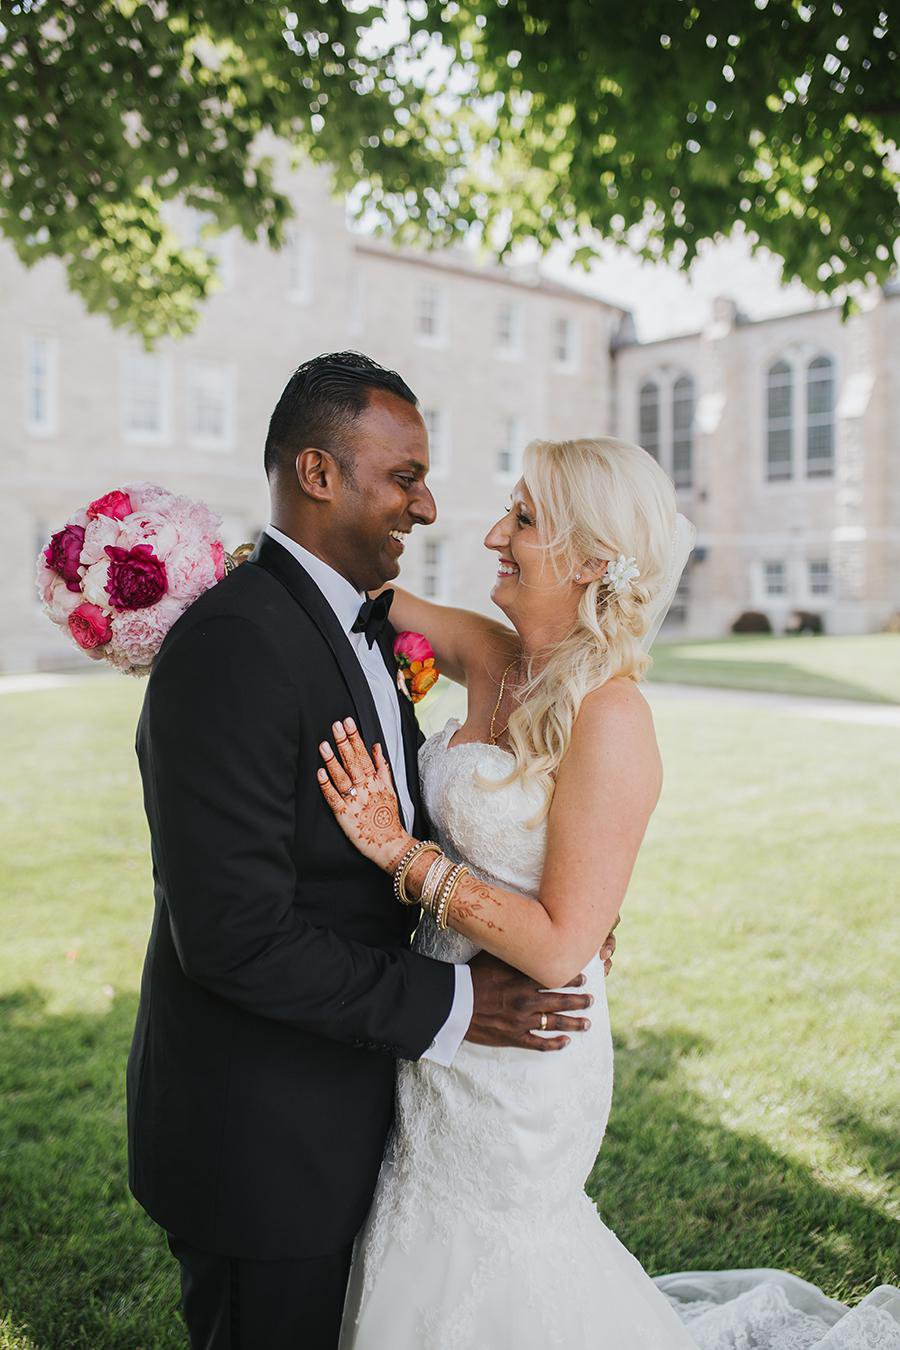 Megan Cope & Clement Balasundaram